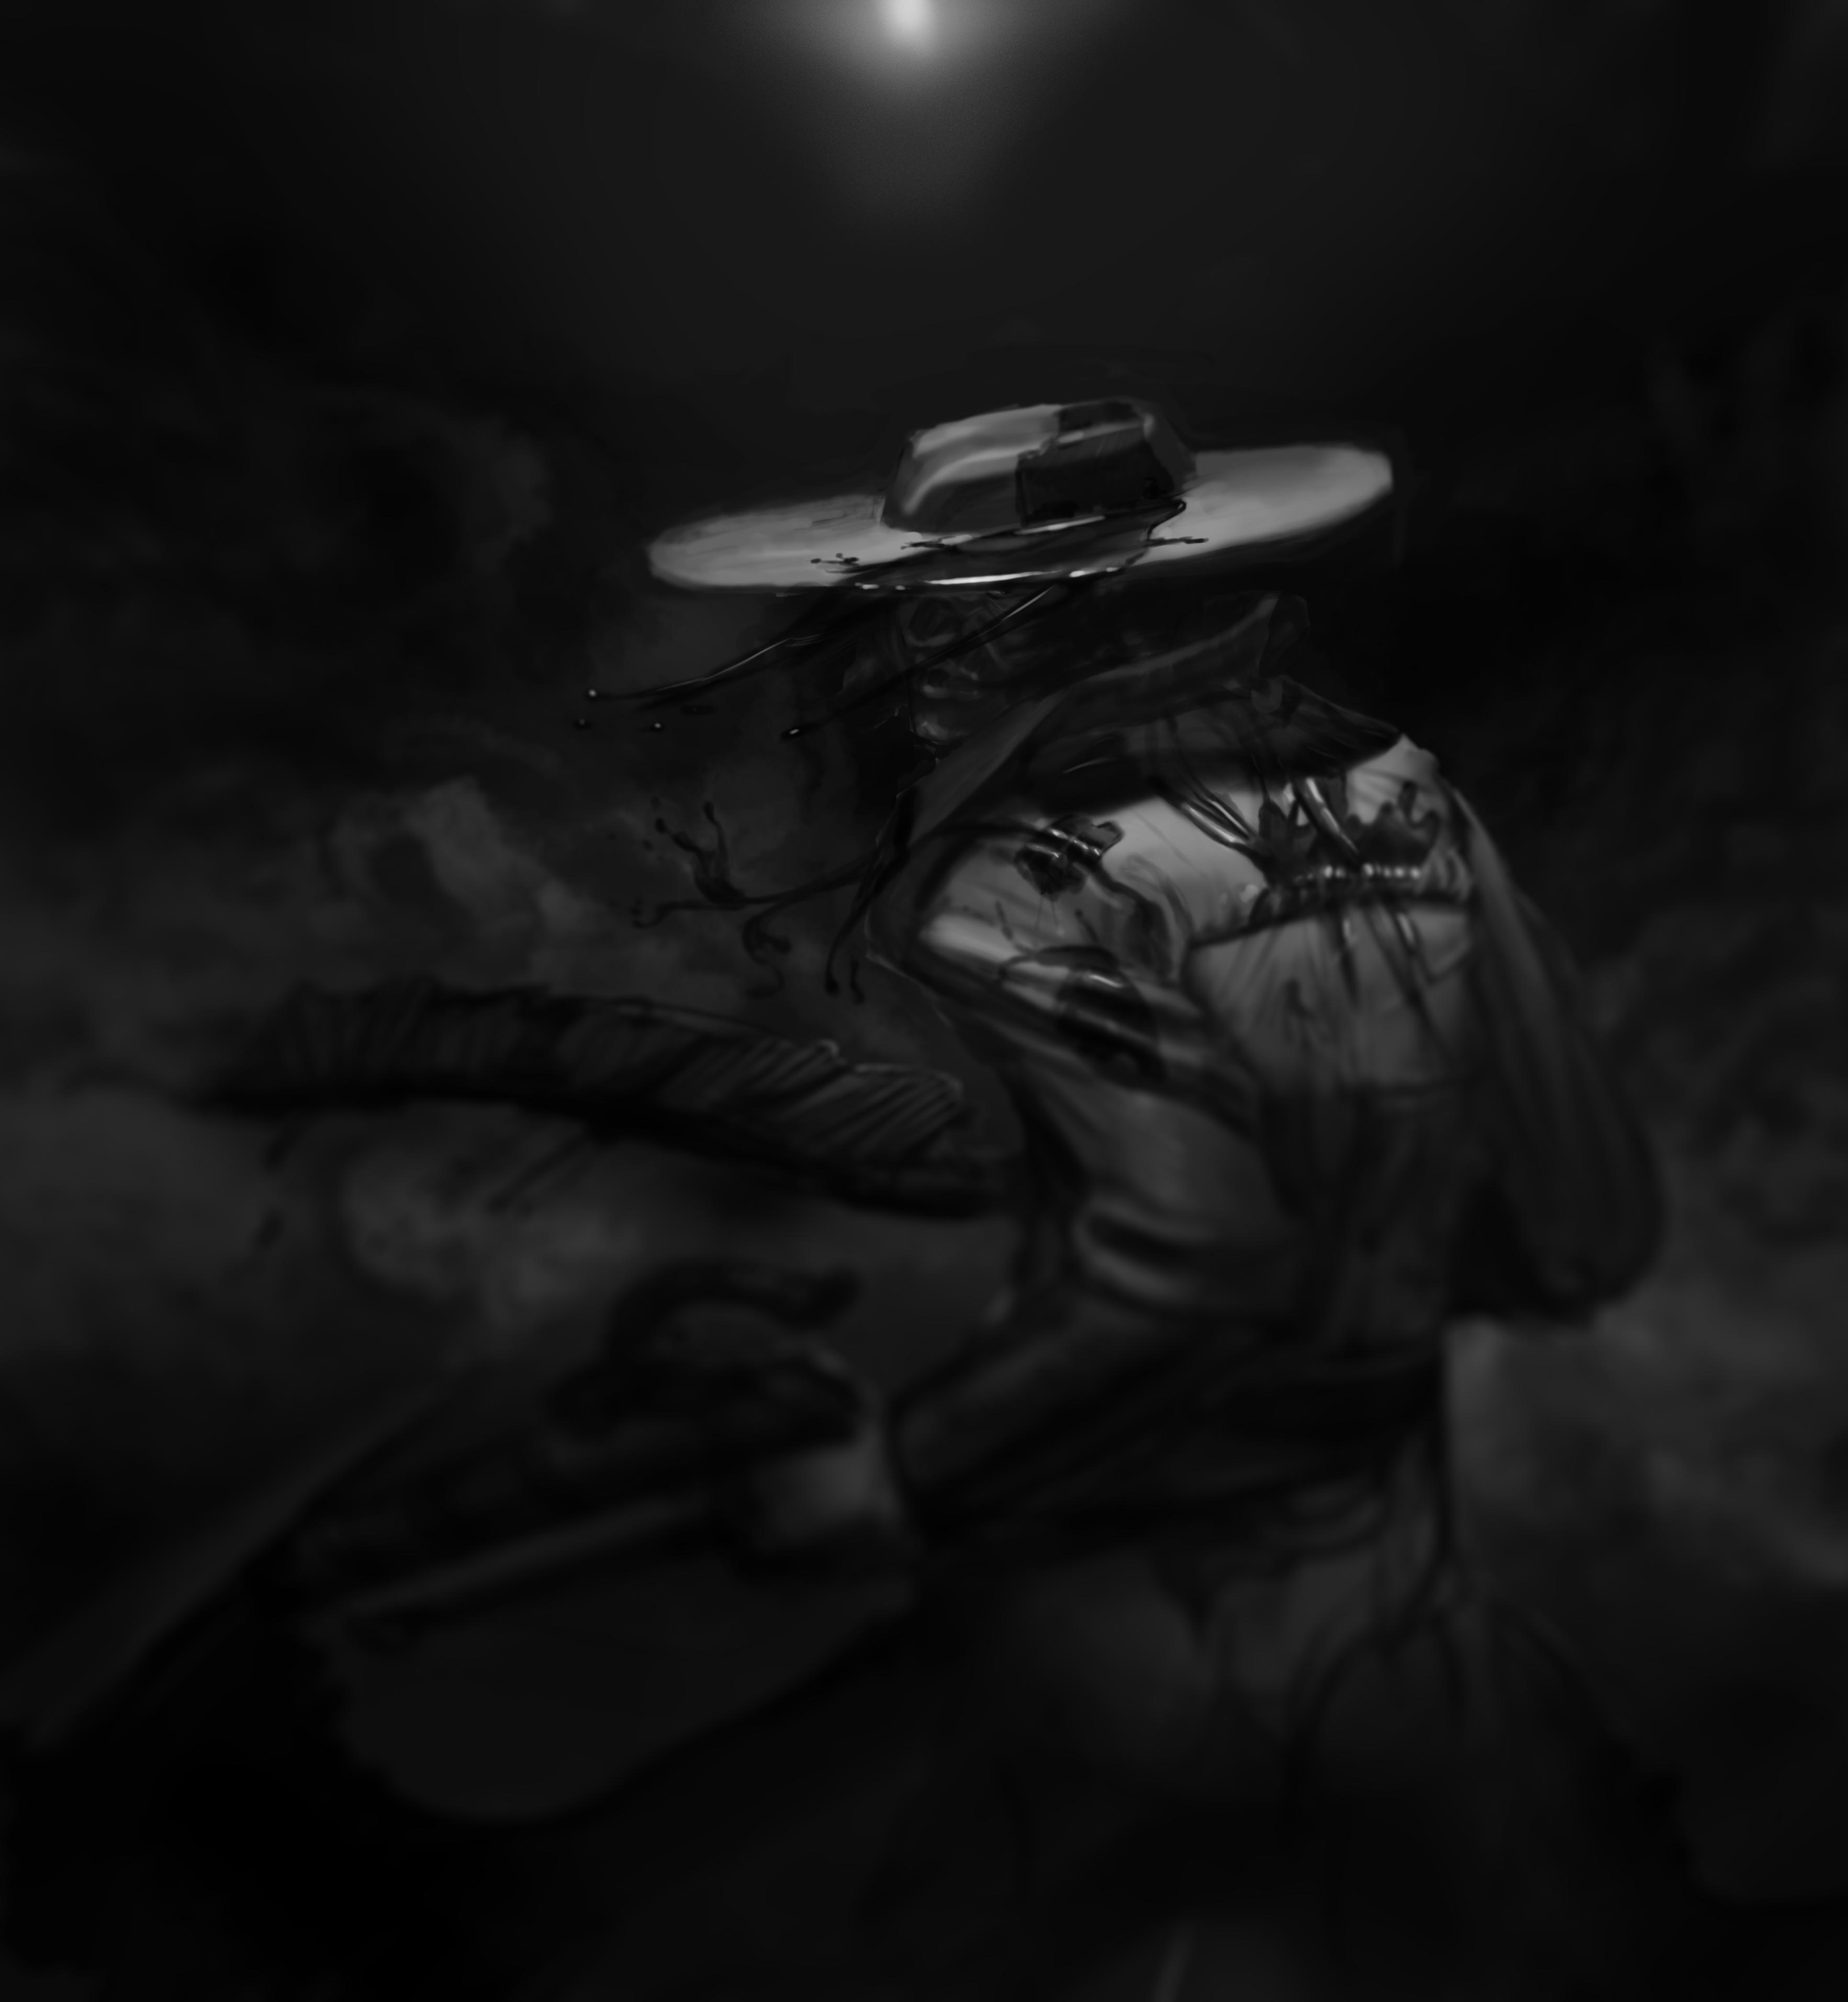 Bloodborne fanart. - Изображение 1